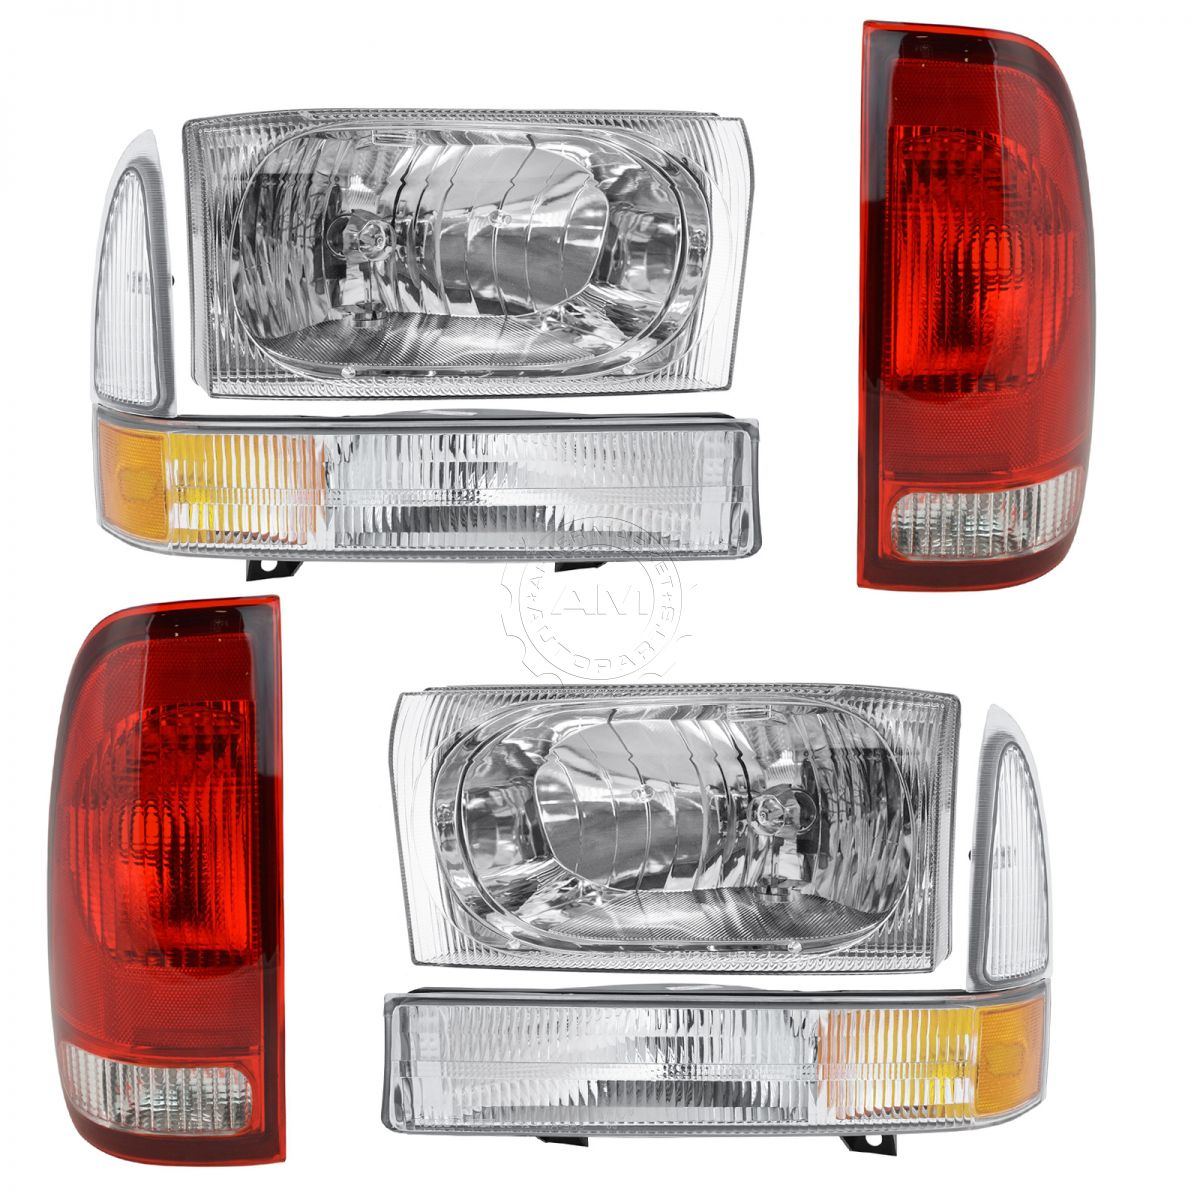 Headlight Tail Light Parking Marker Lamp For 02 04 Ford Super Duty 2004 F 250 Bulbs Truck New